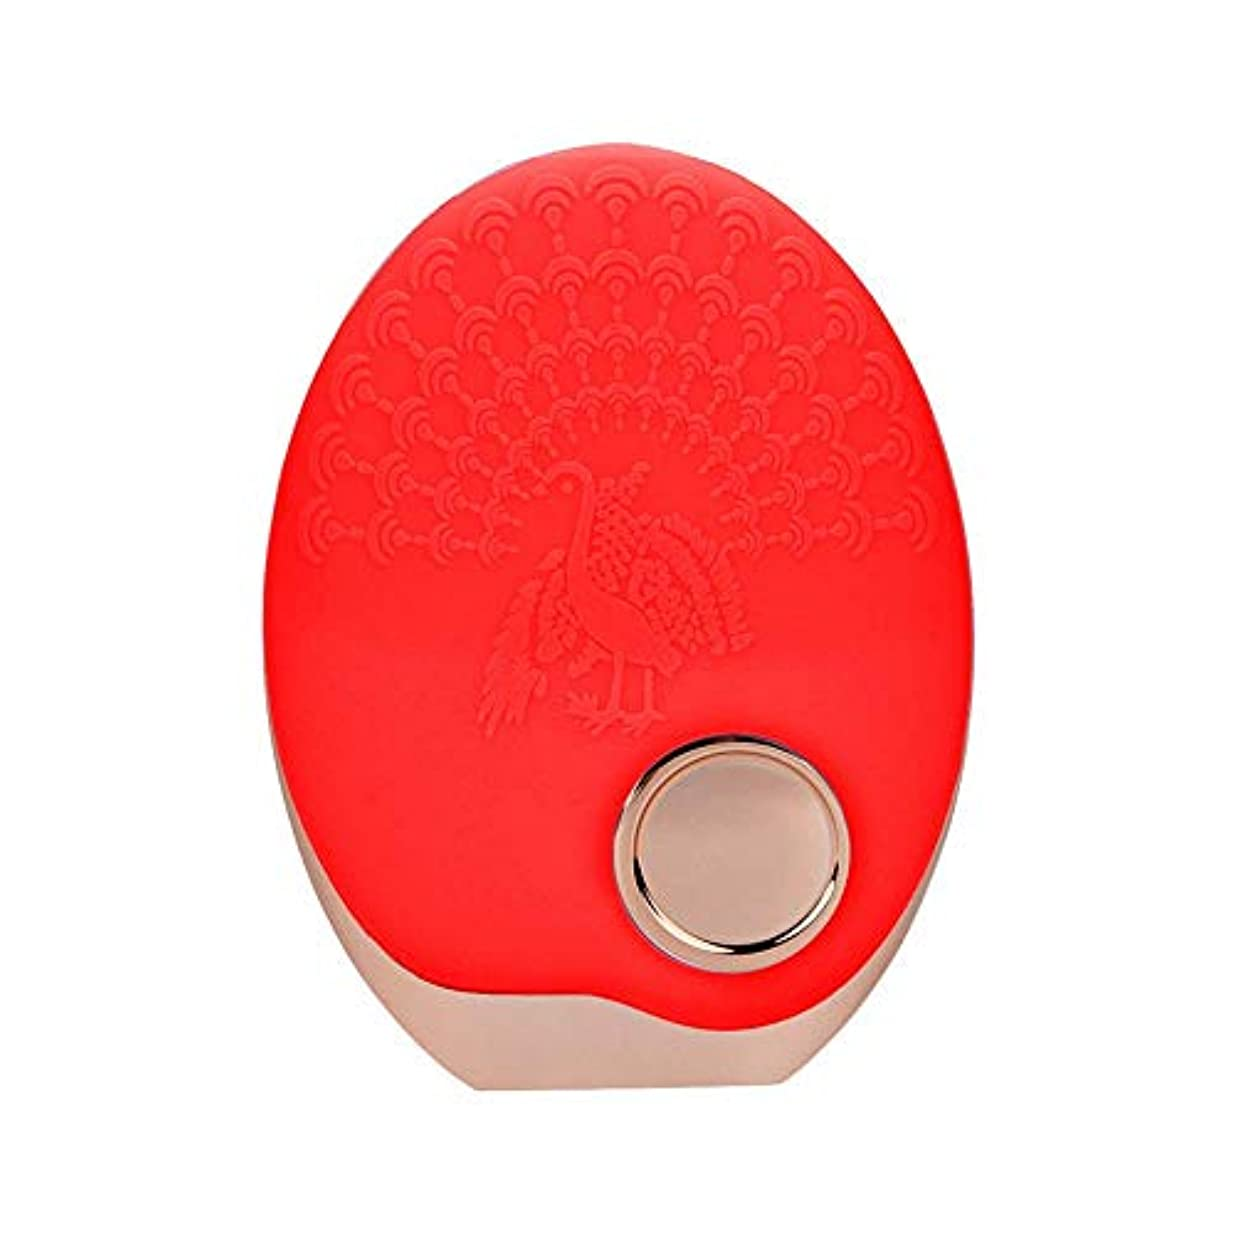 SOUTHTECH 光子活性化クレンジング器具 顔の清潔になるブラシ、3色LEDの光子ライトが付いている超音波無線充満表面剥離のブラシのシリコーンの防水マッサージャー (赤)